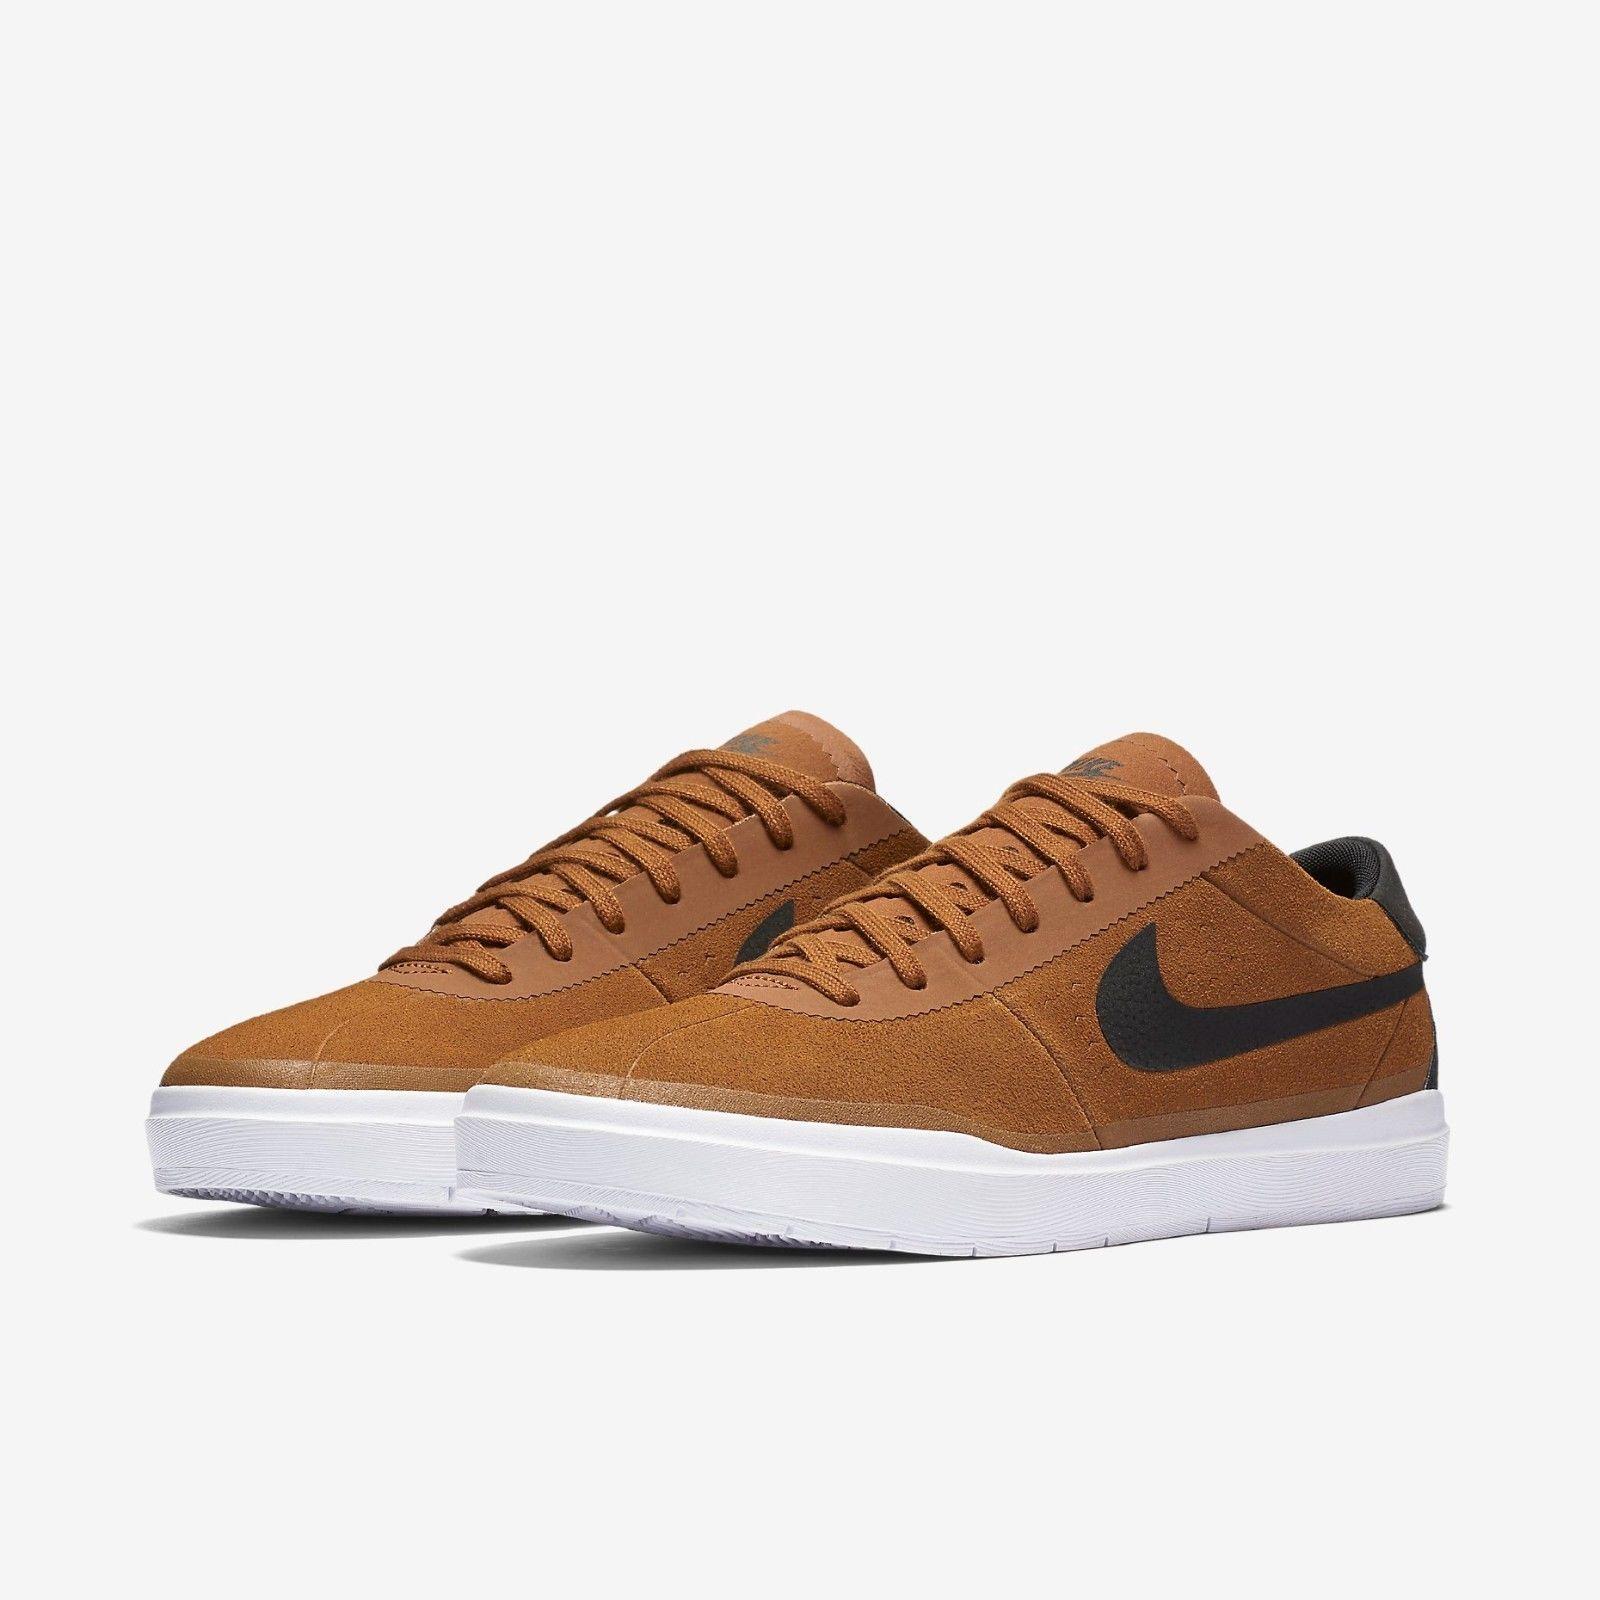 ab08352229b Nike SB Bruin Hyperfeel Shoes in Hazelnut Black White - 9.5 NWT 831756-202